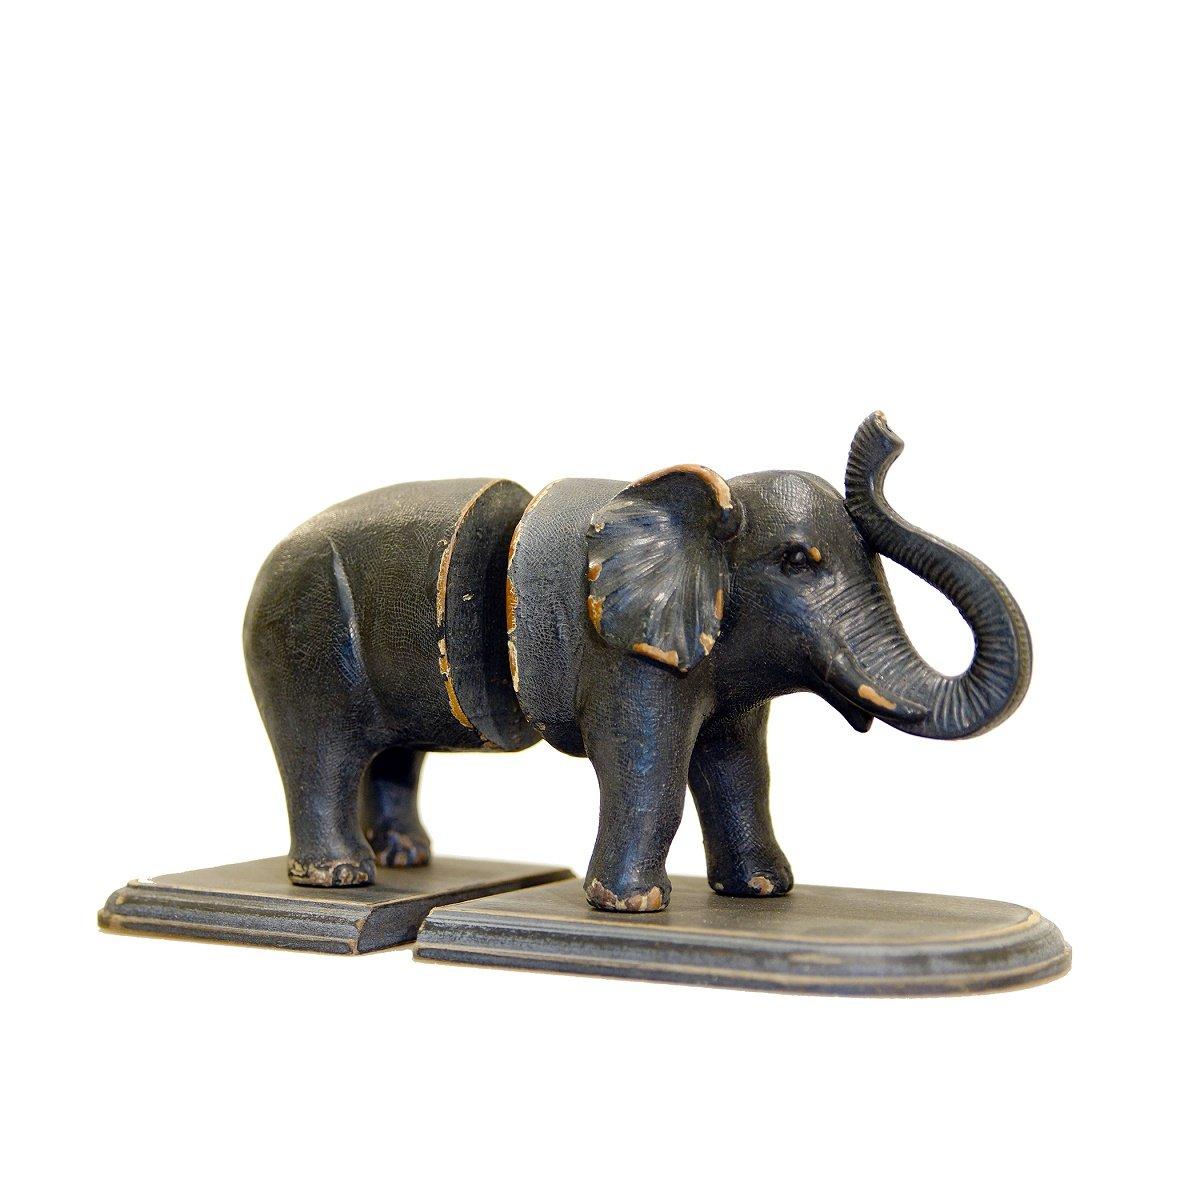 Dark Gray Elephant Shaped Bookends - Jungle Animal Figure Statues Shelf Decor